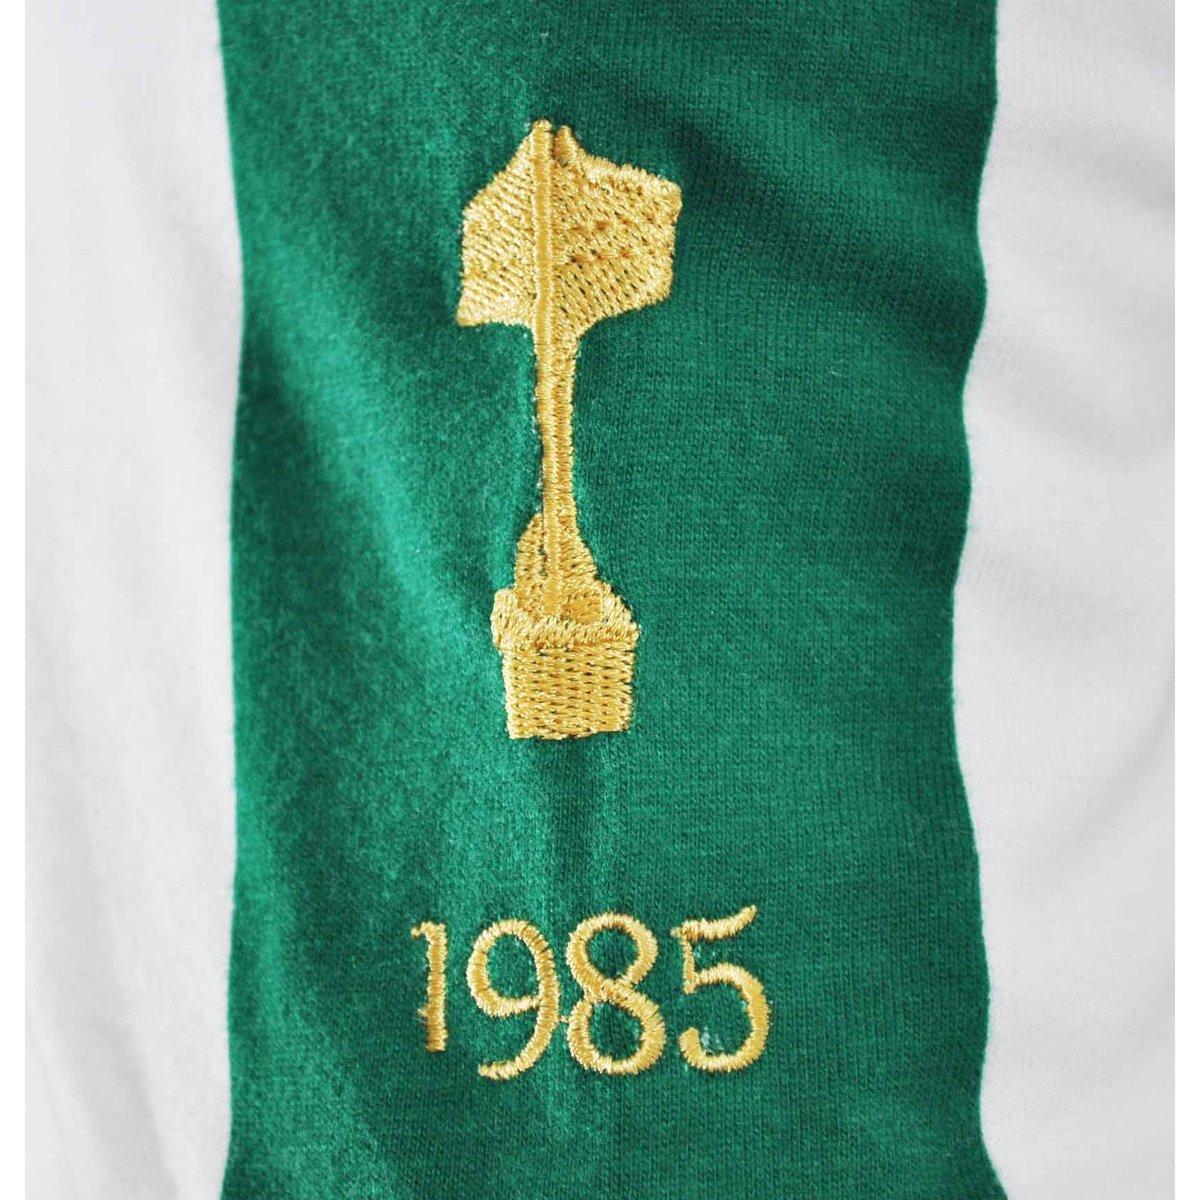 Camisa 1985 Feminina Mania Retrô Retrô Camisa Coritiba Verde 6wgBUSq